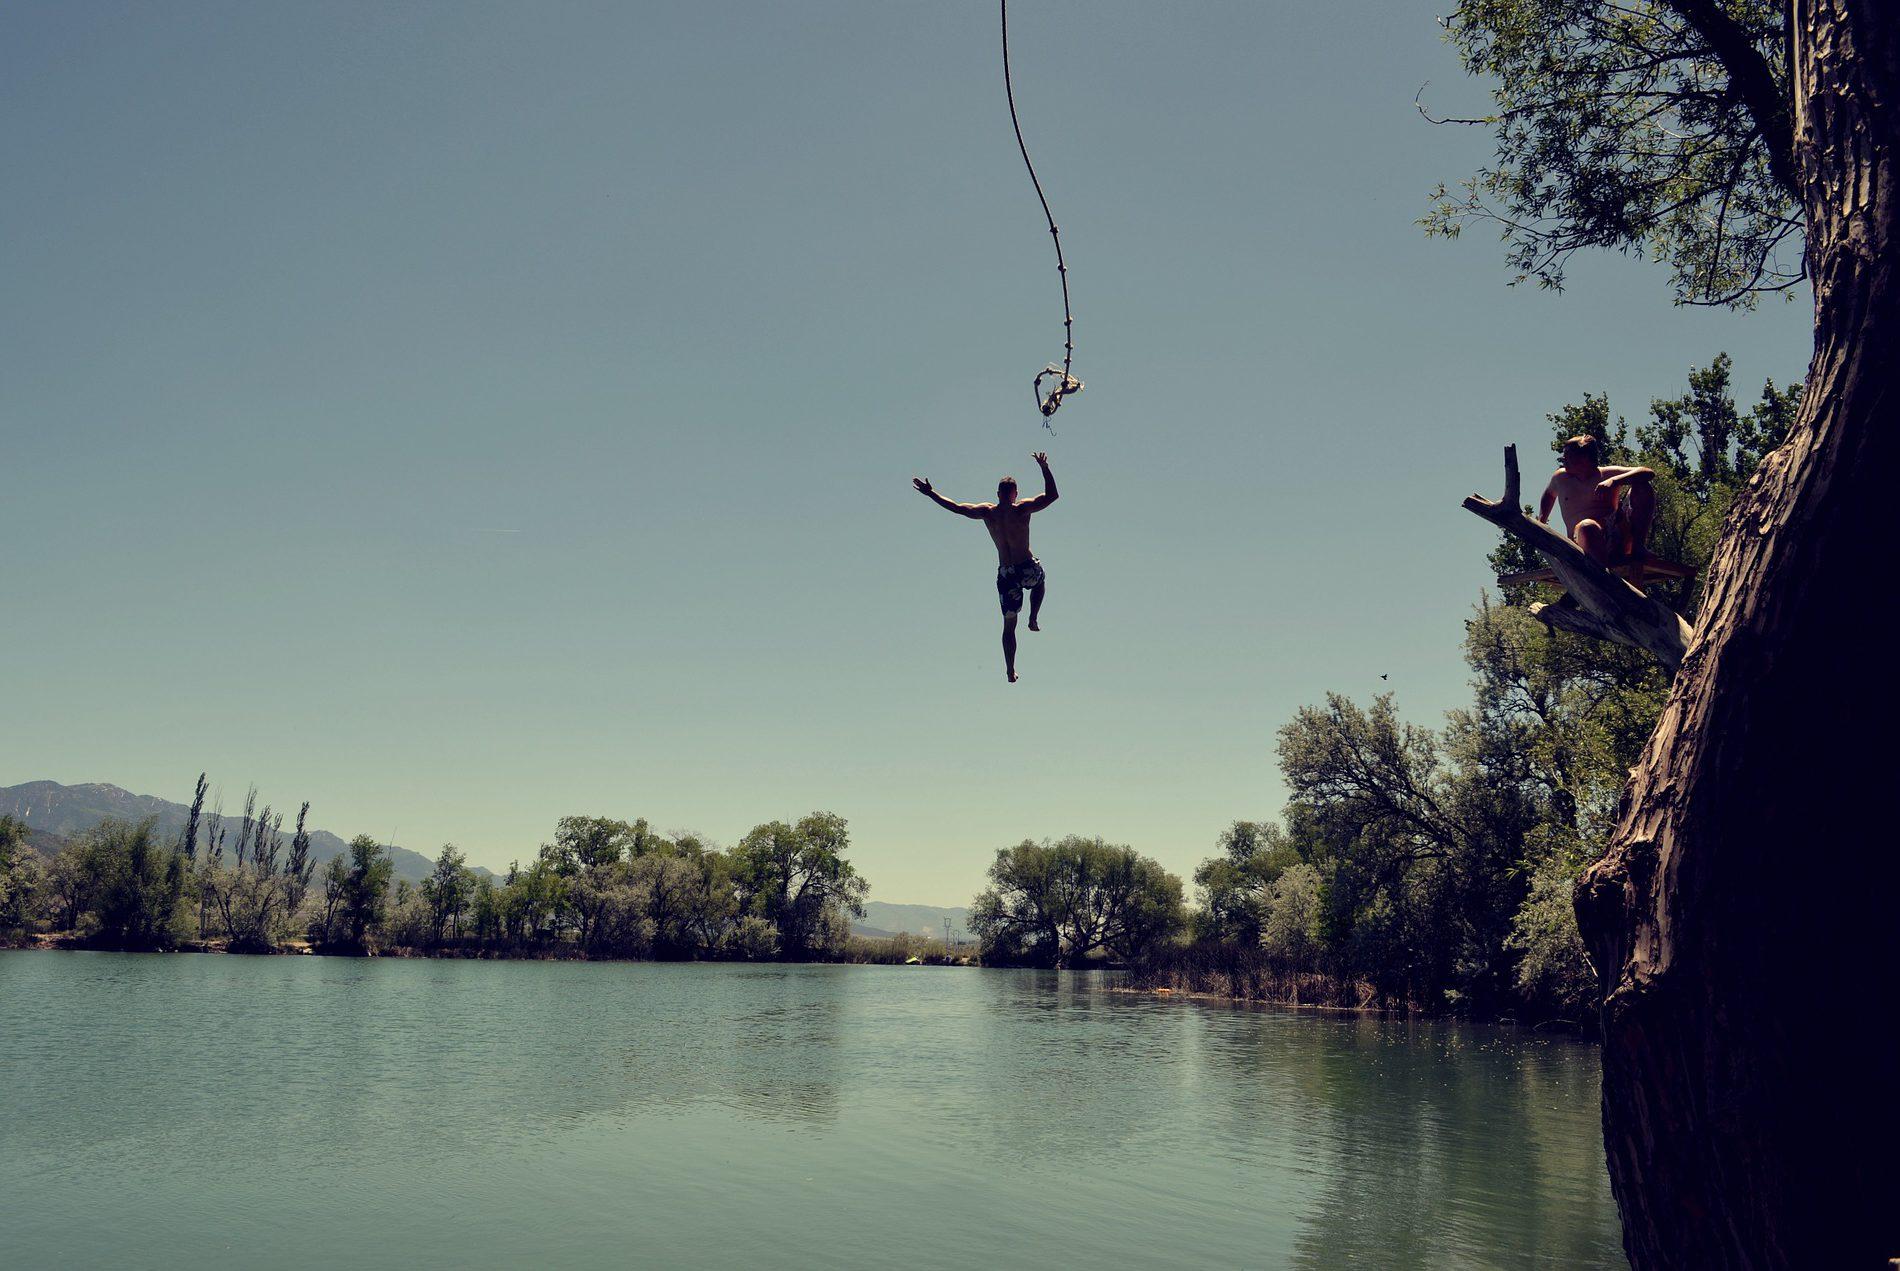 rope jumping роупджампинг роуп джампинг